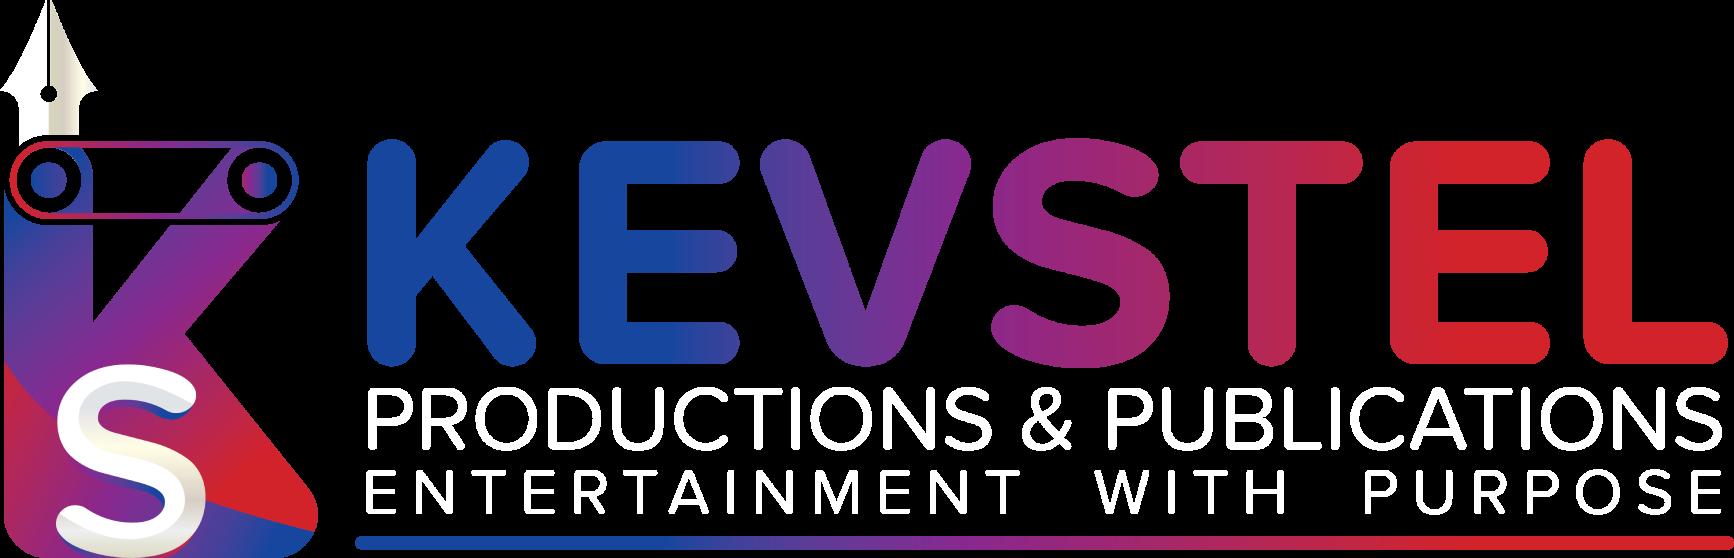 Kevstel Productions & Publications